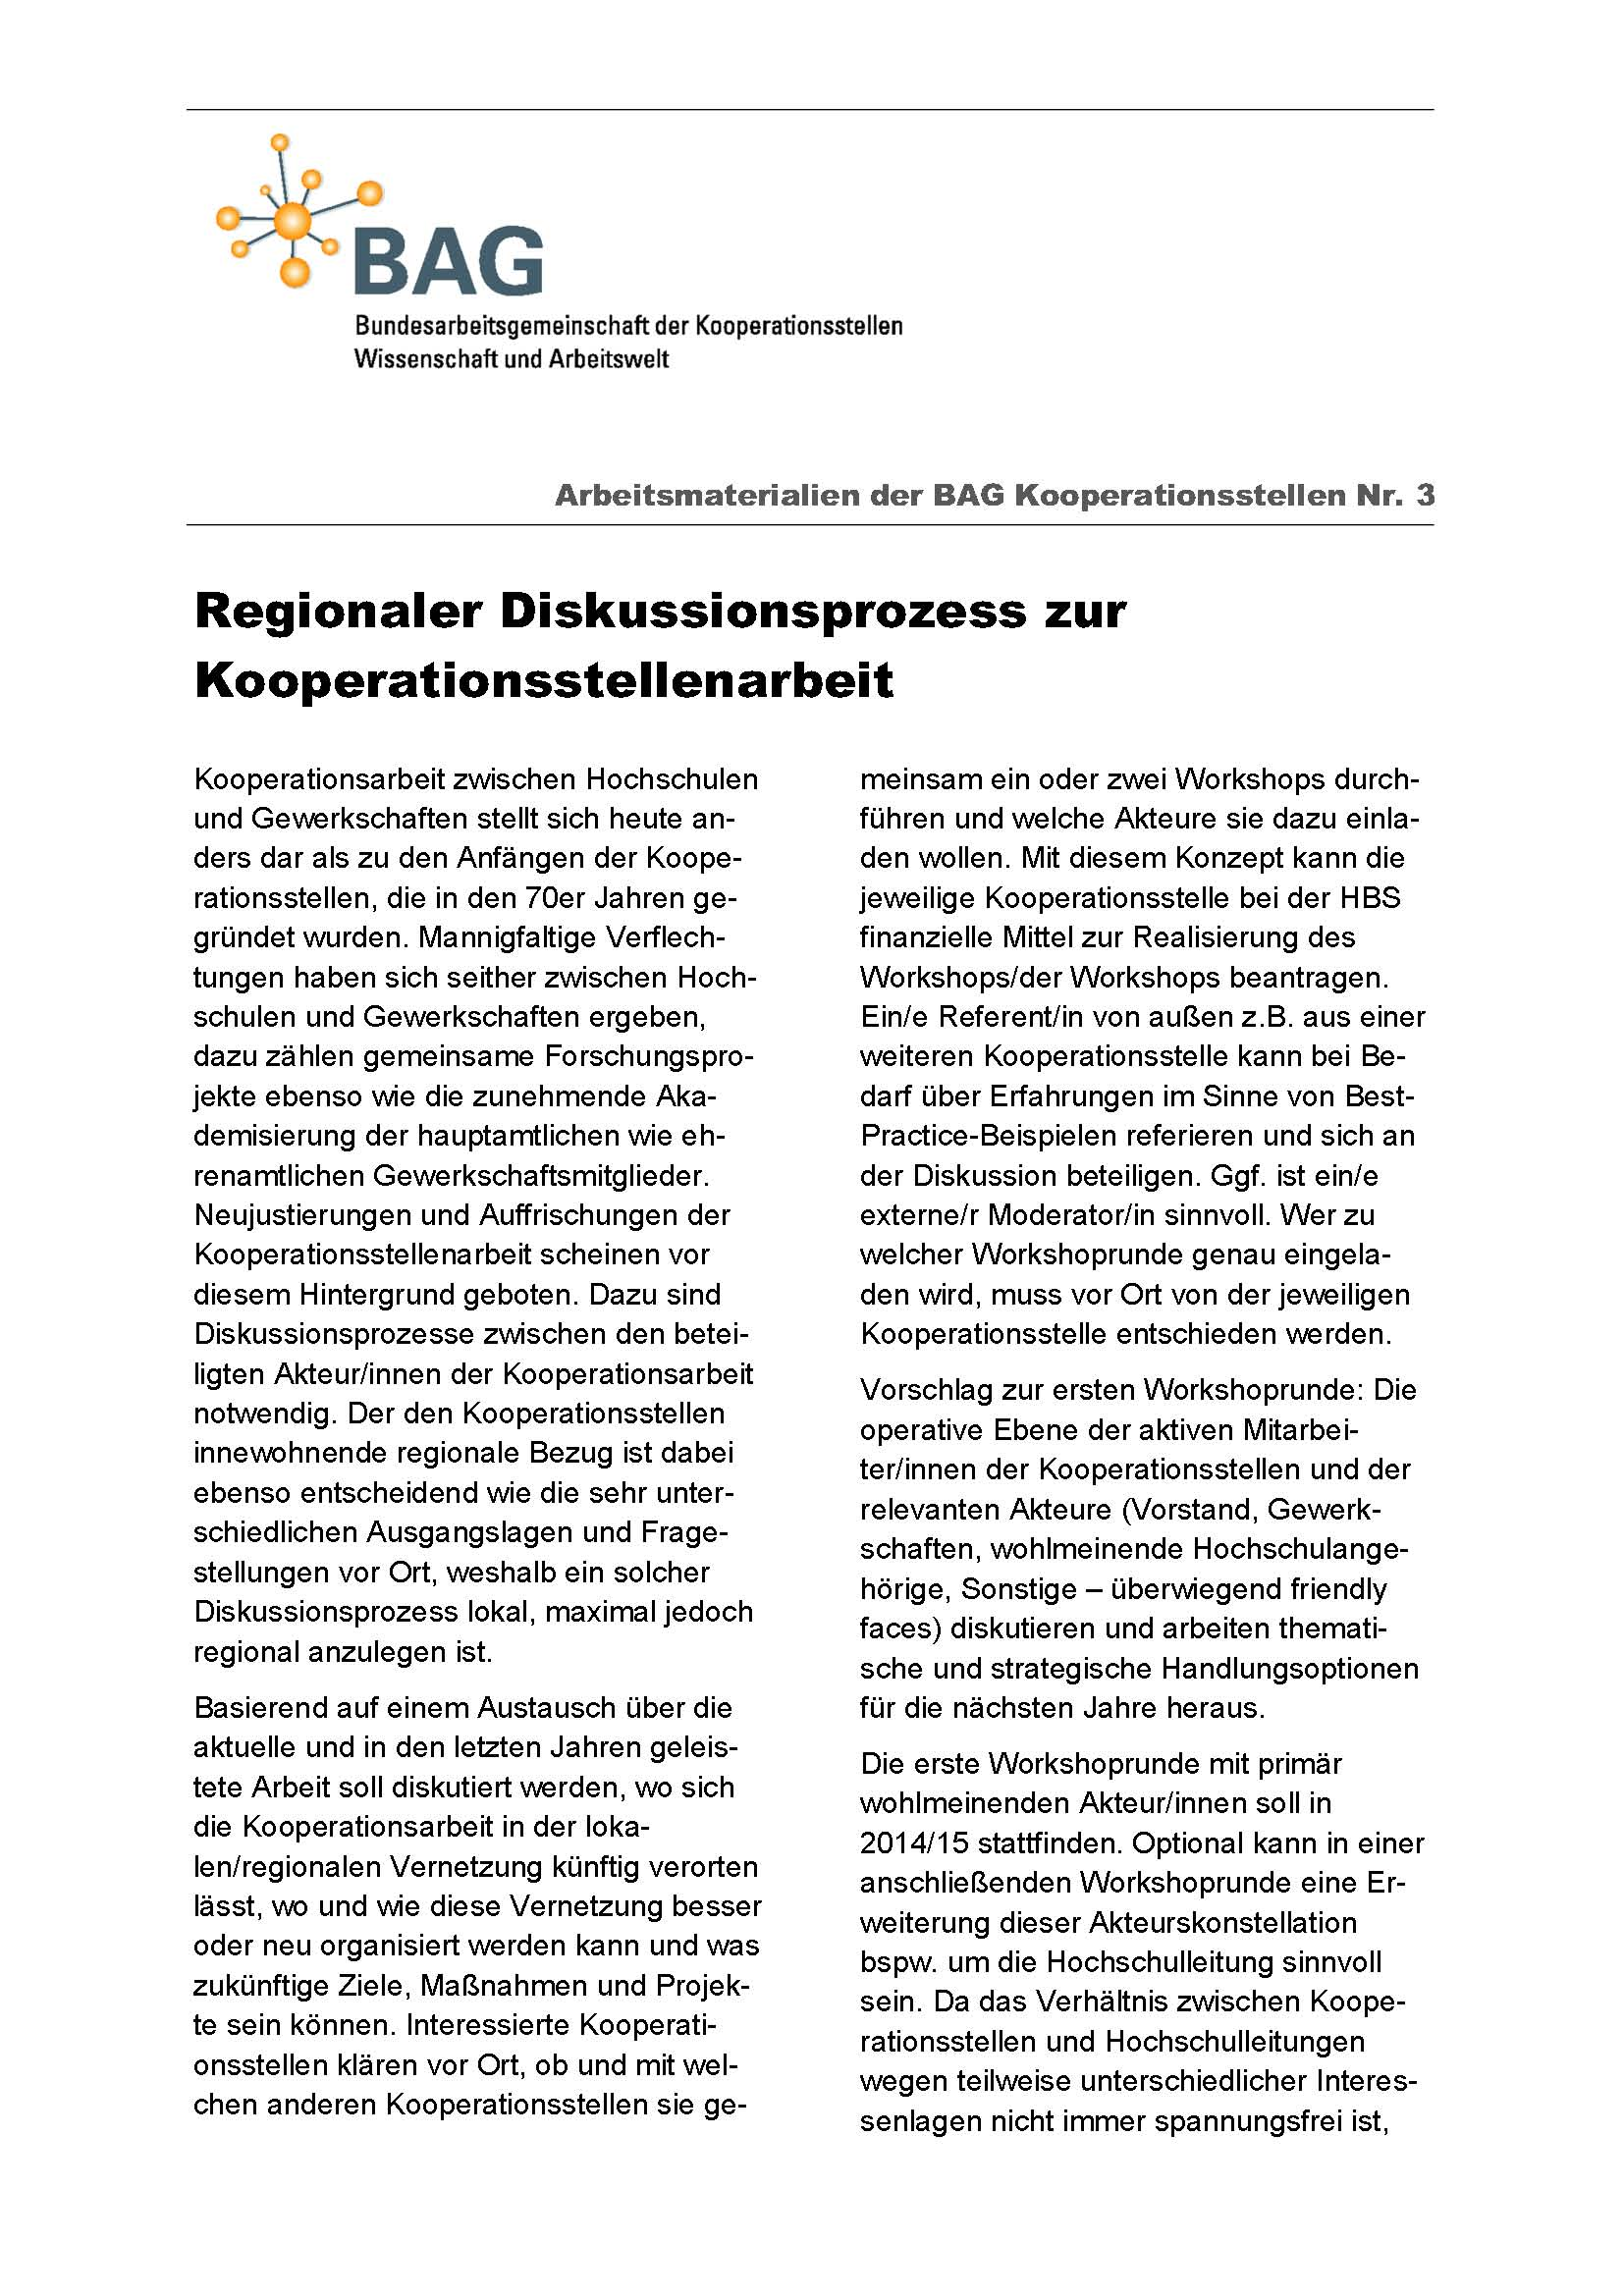 Arbeitsmaterialien der BAG Kooperationsstellen Nr. 3